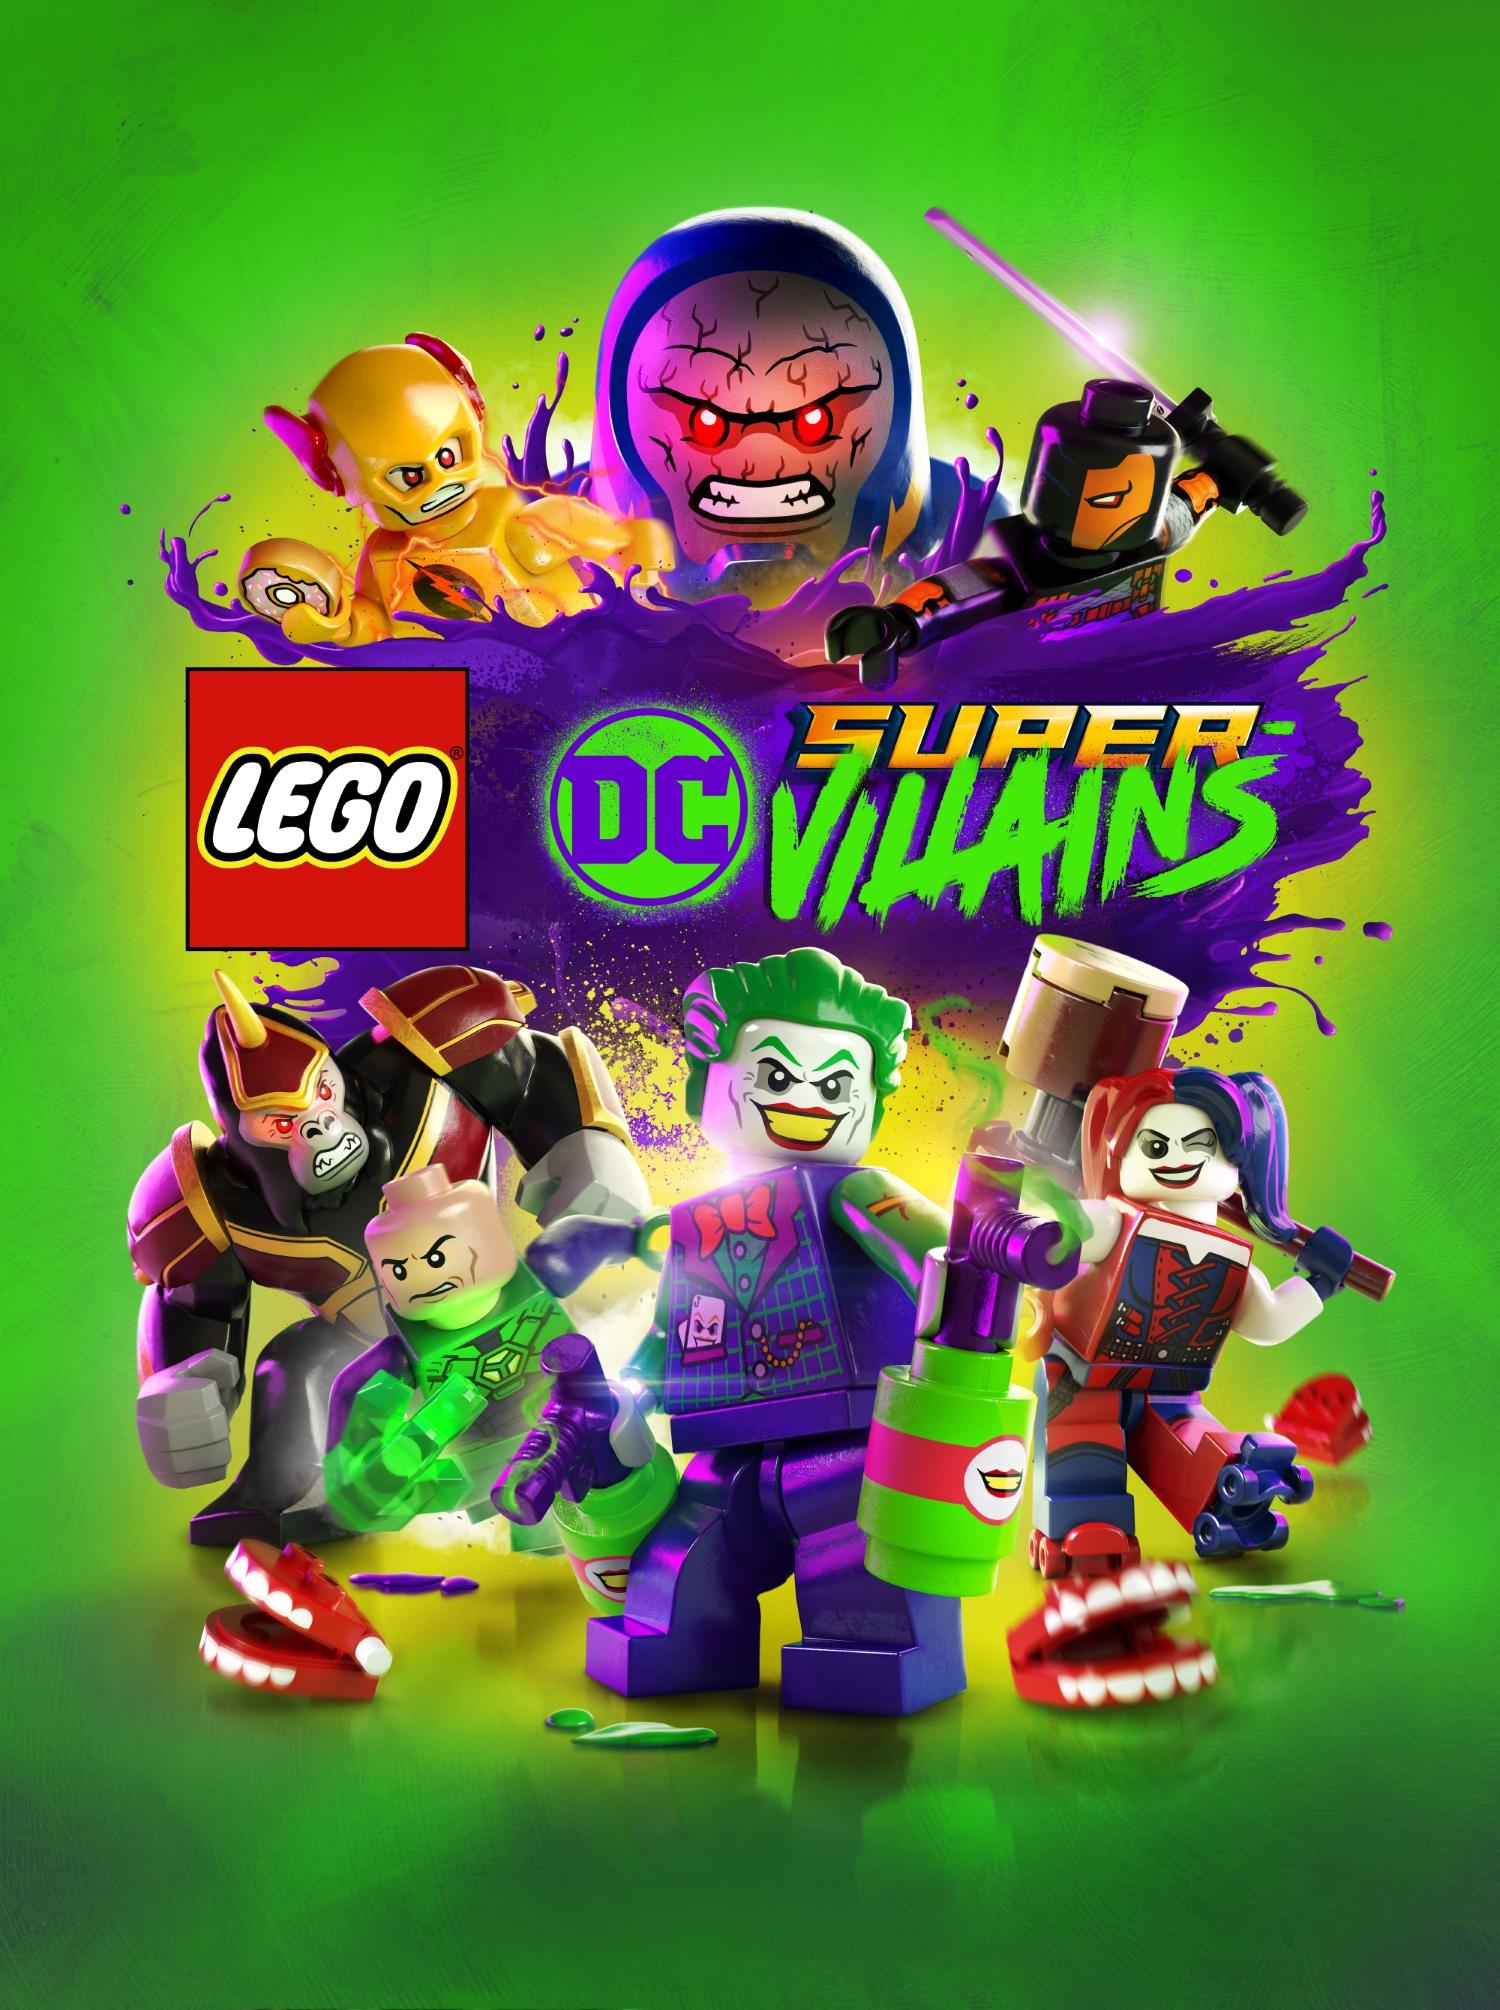 Lego DC Super-Villains review – hitting a brick wall